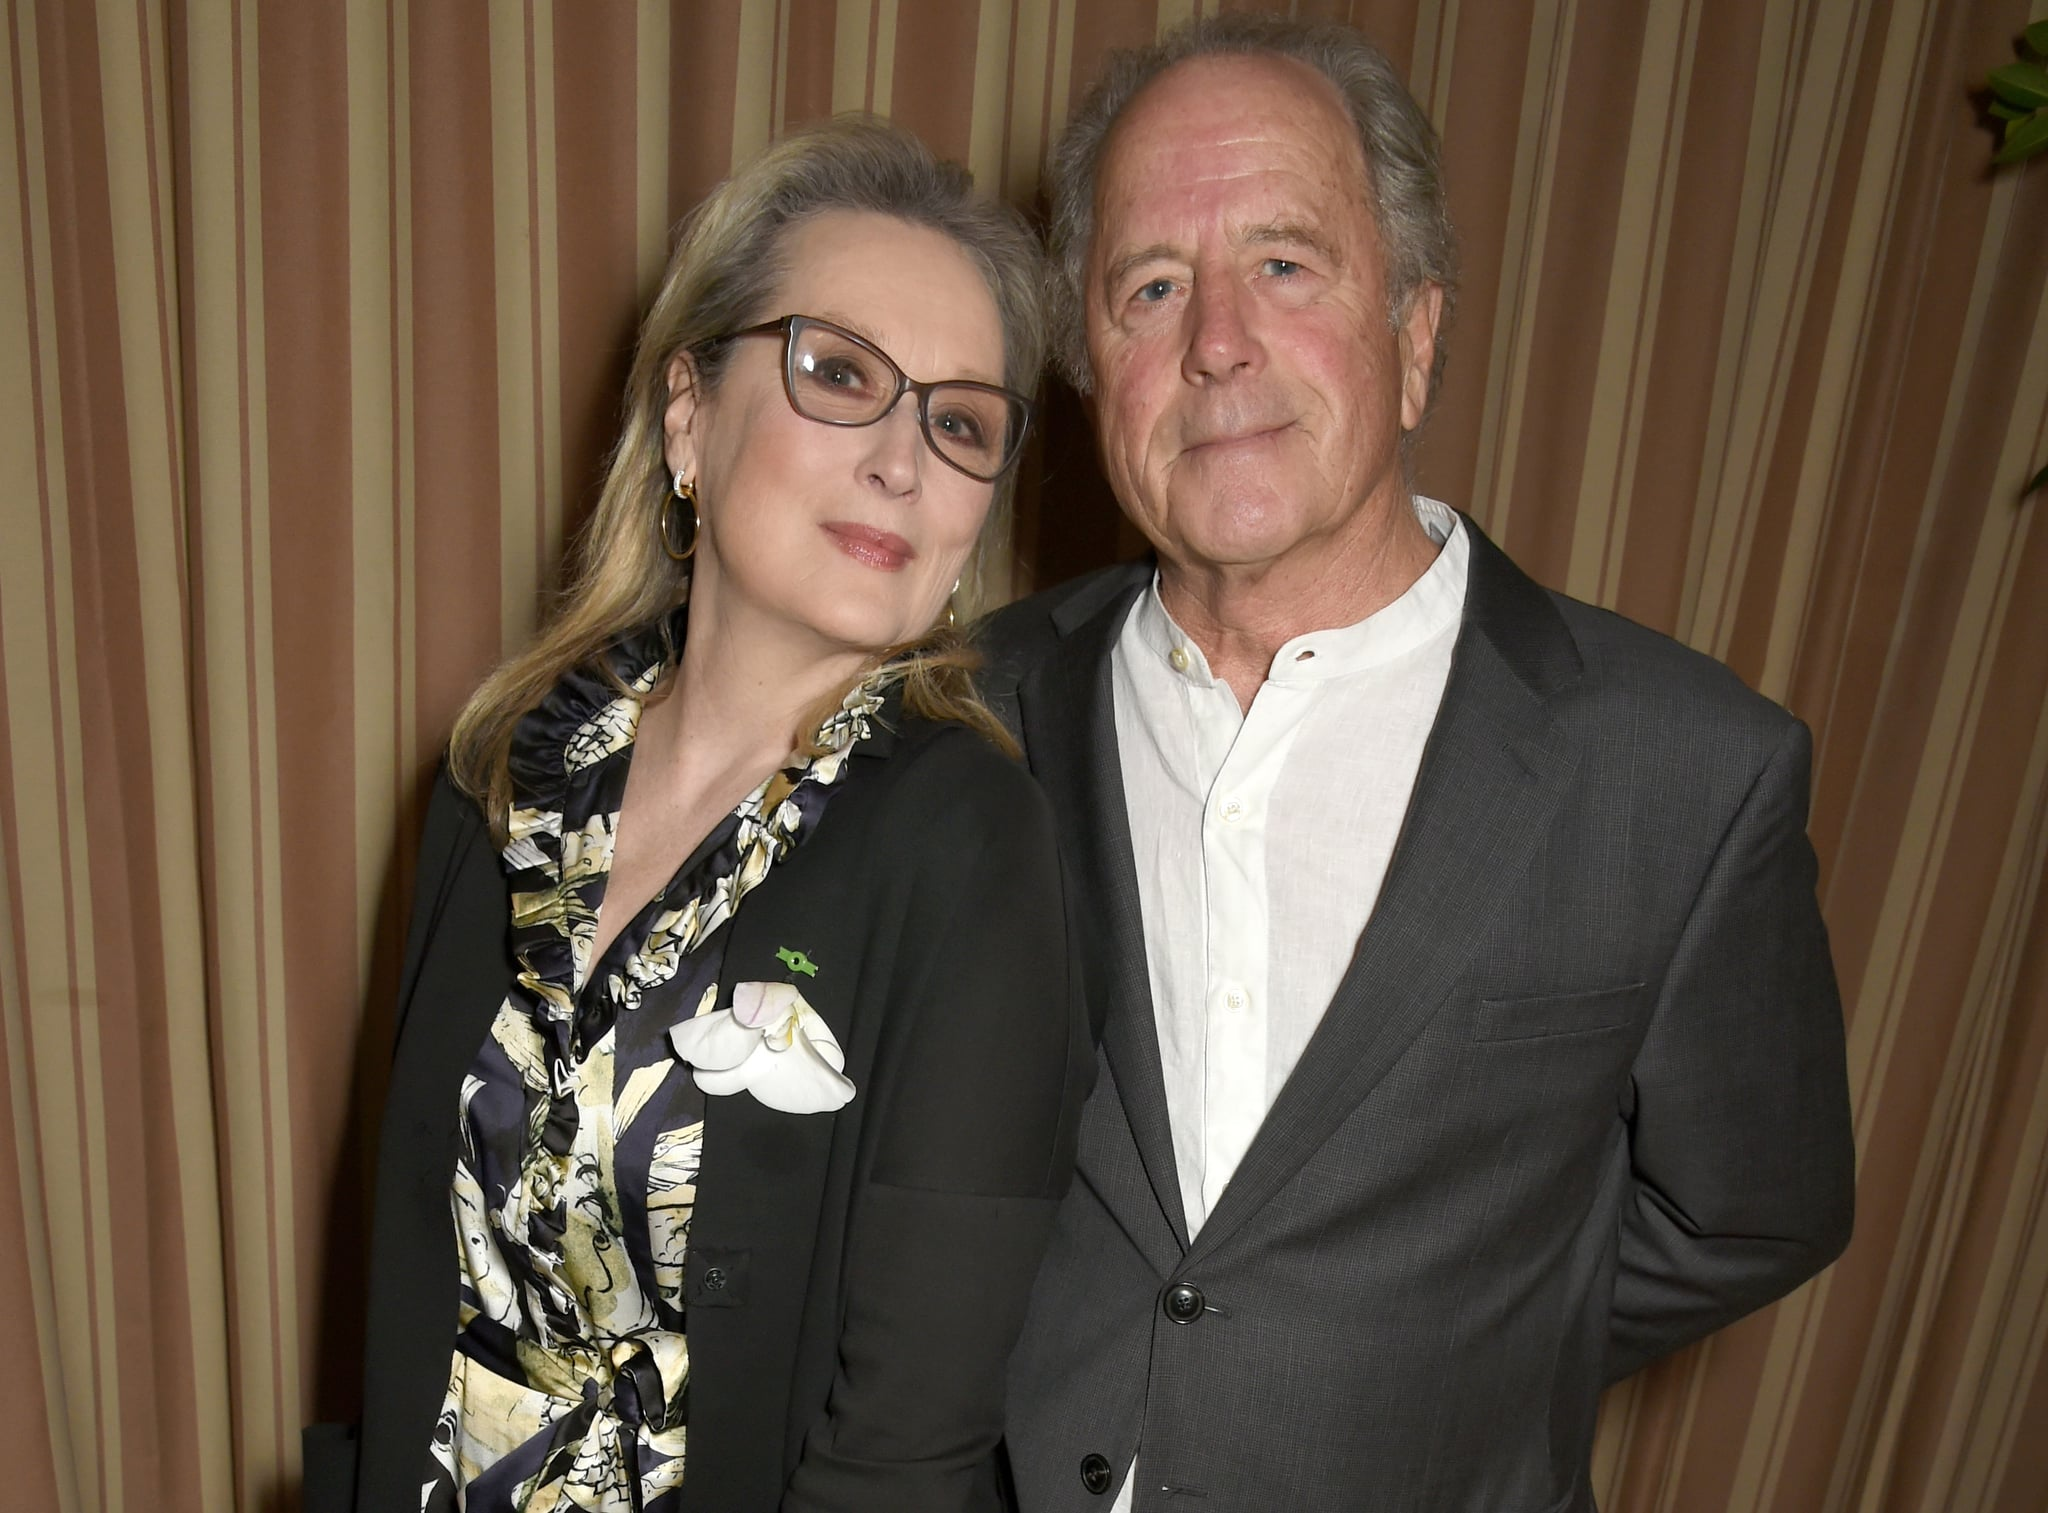 Who Is Meryl Streep Married To? | POPSUGAR Celebrity